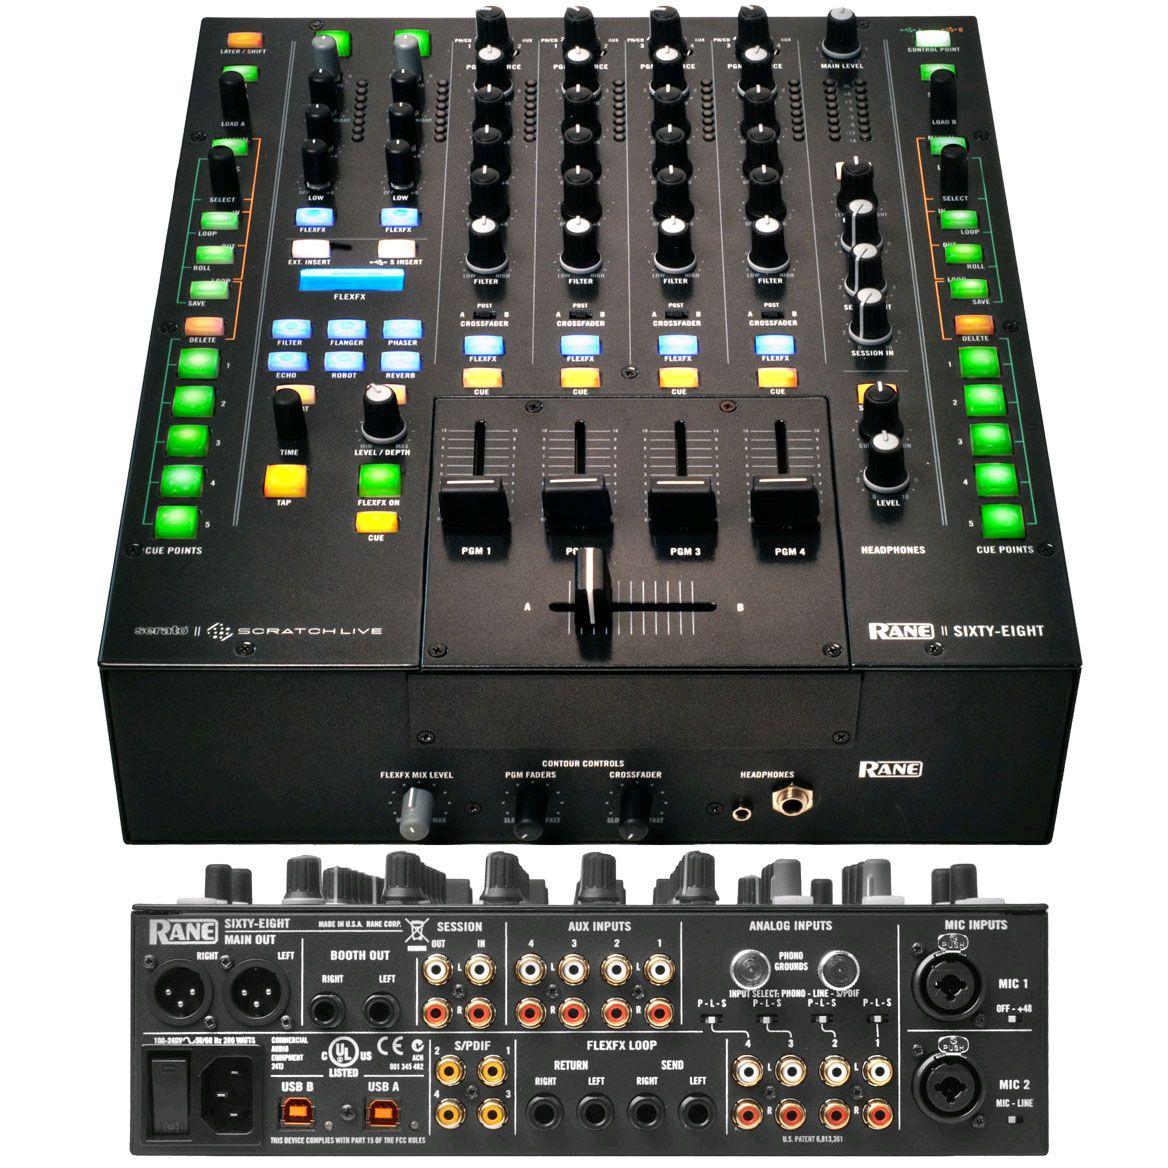 rane scratch live dj mixer dj mixers music dj equipment music production equipment. Black Bedroom Furniture Sets. Home Design Ideas